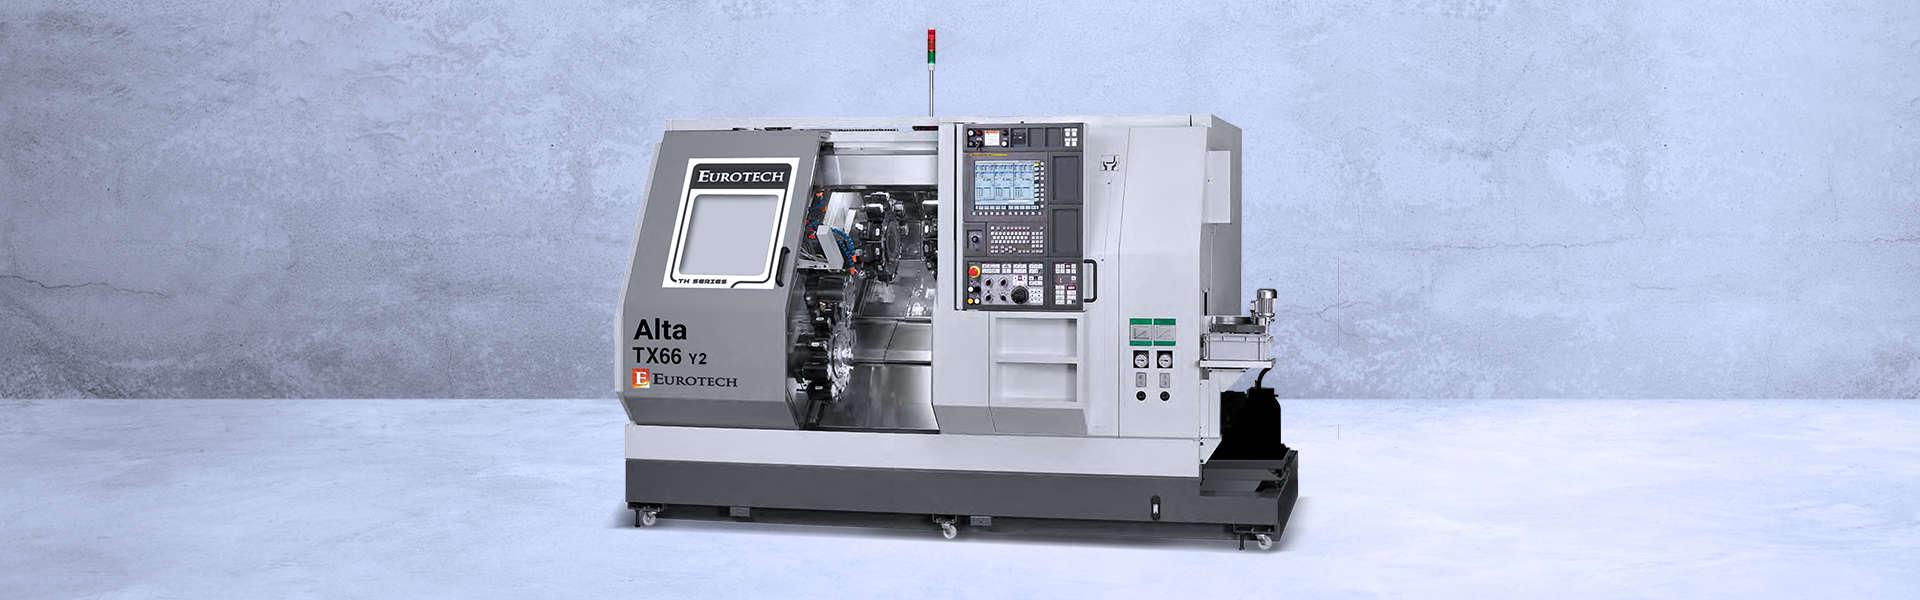 Eurotech TX-66Y2